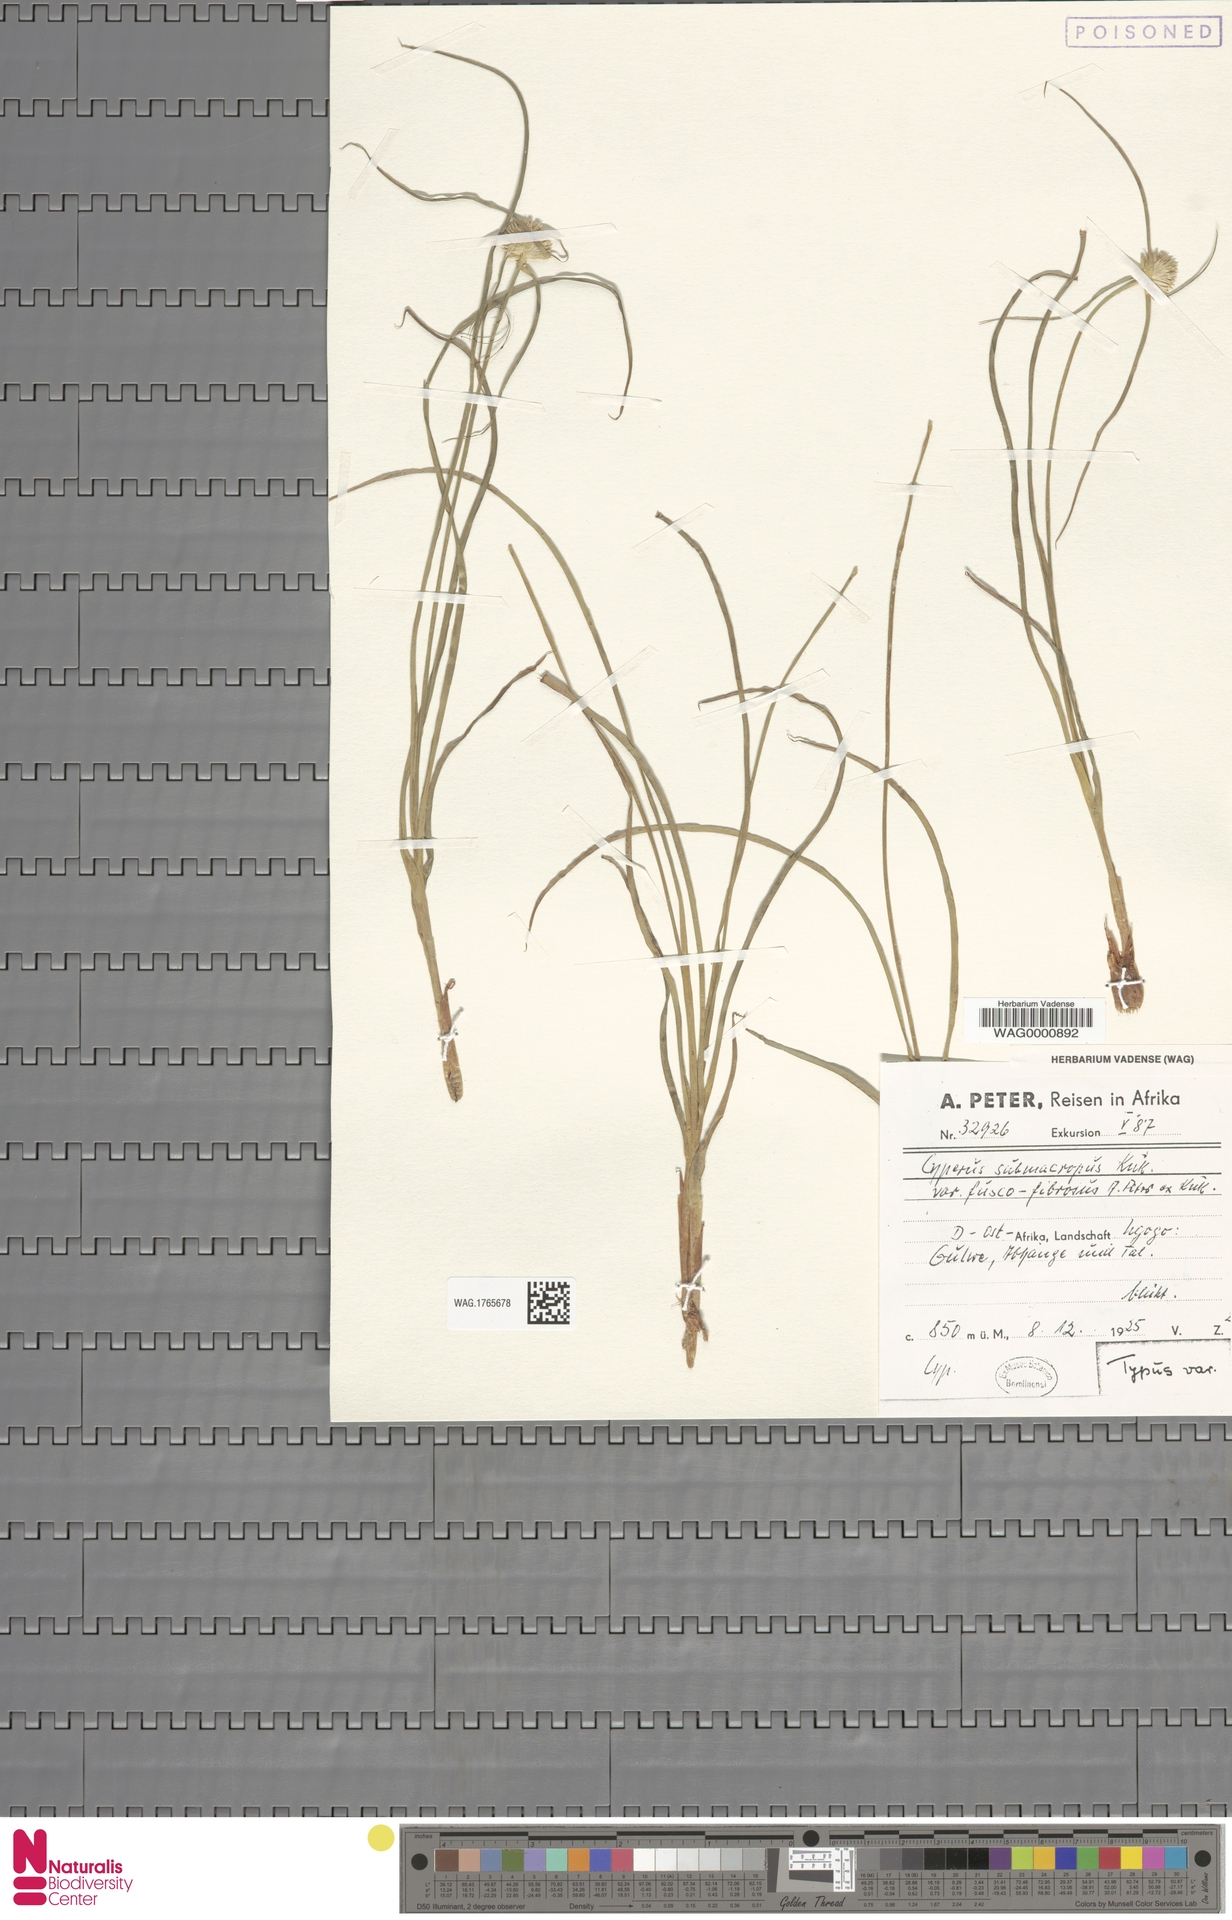 WAG.1765678 | Cyperus submacropus var. fusco-fibrosus Peter ex Kük.